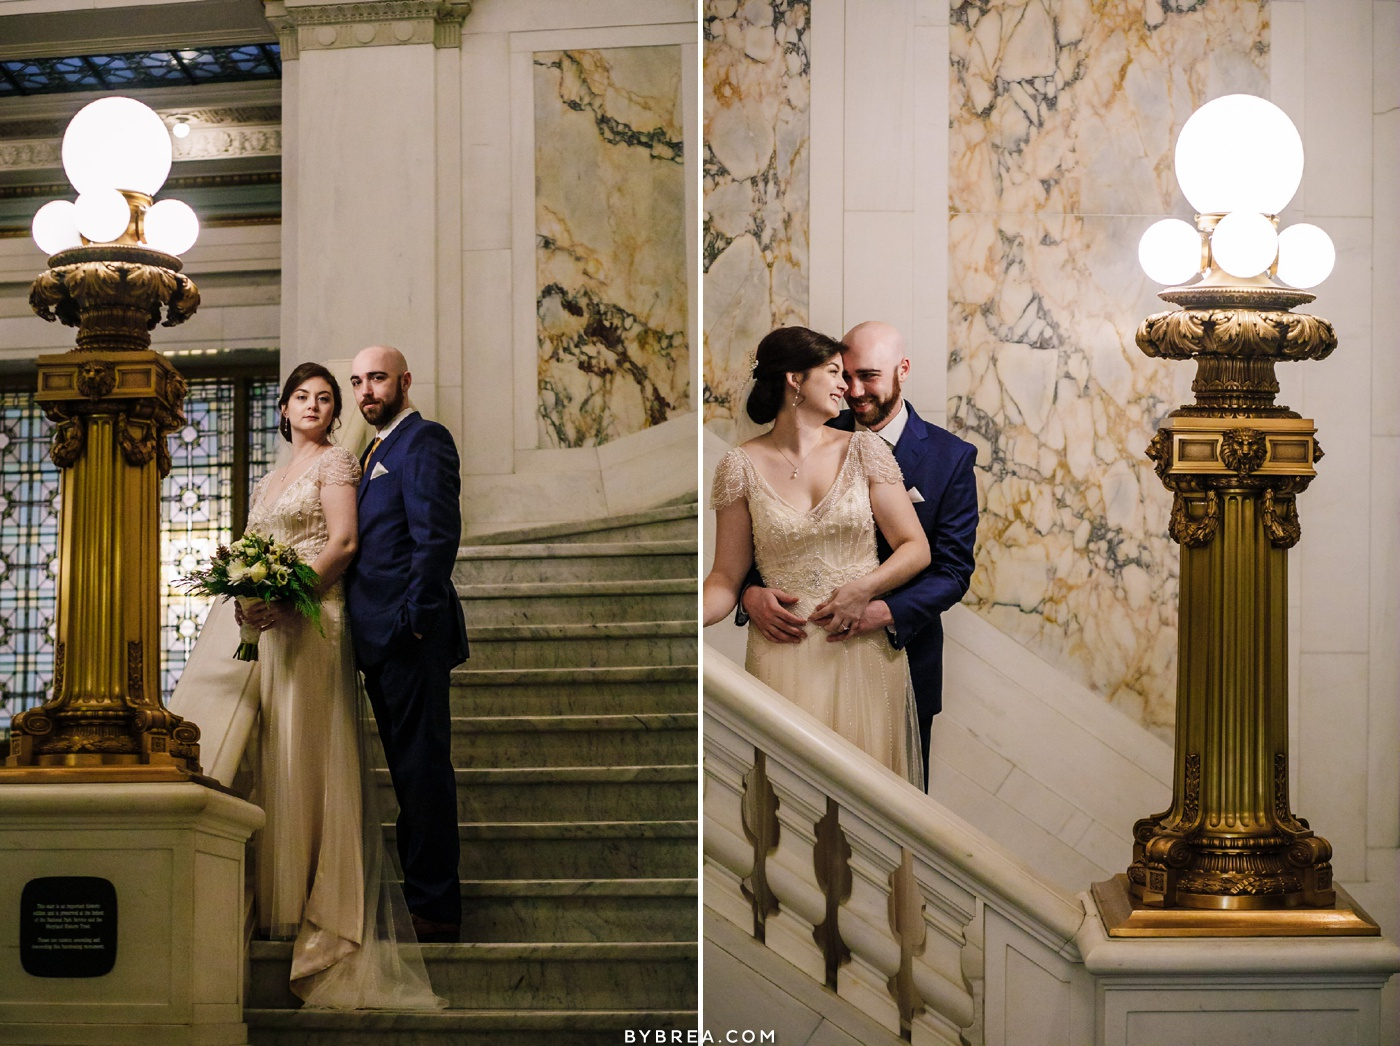 Bride and groom staircase portrait Hotel Monaco Baltimore wedding